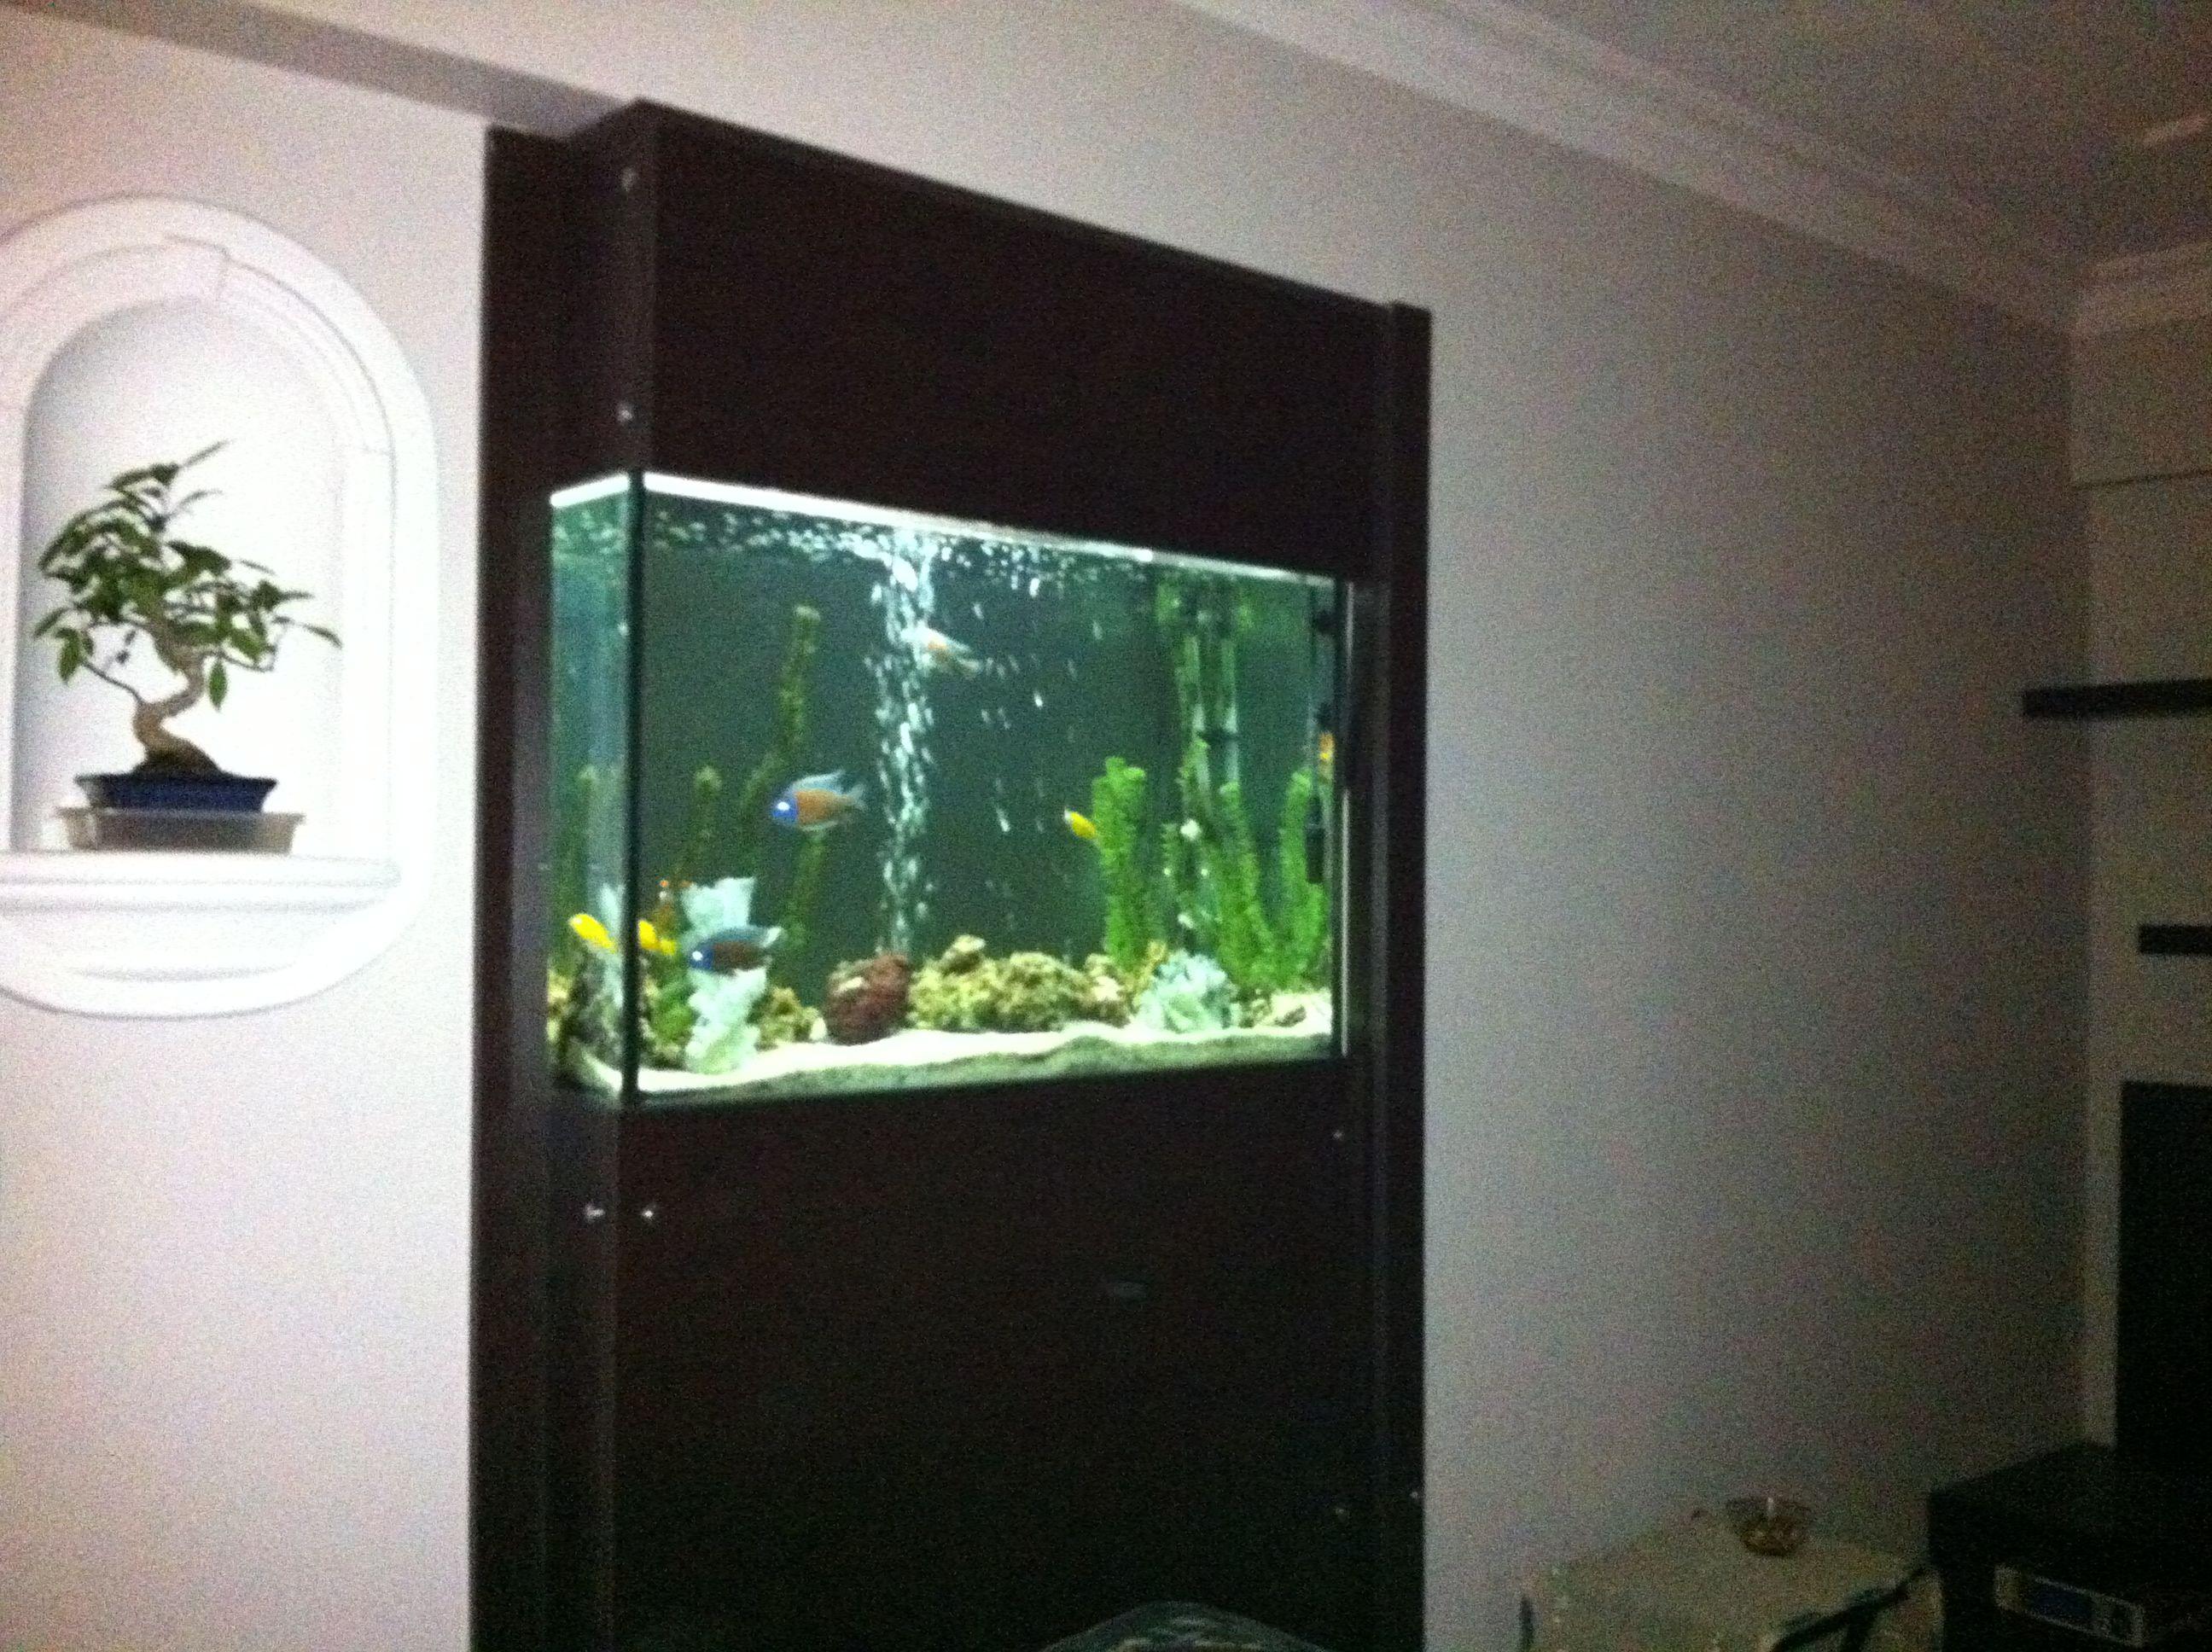 Indoor Aquarium All About The Home Pinterest